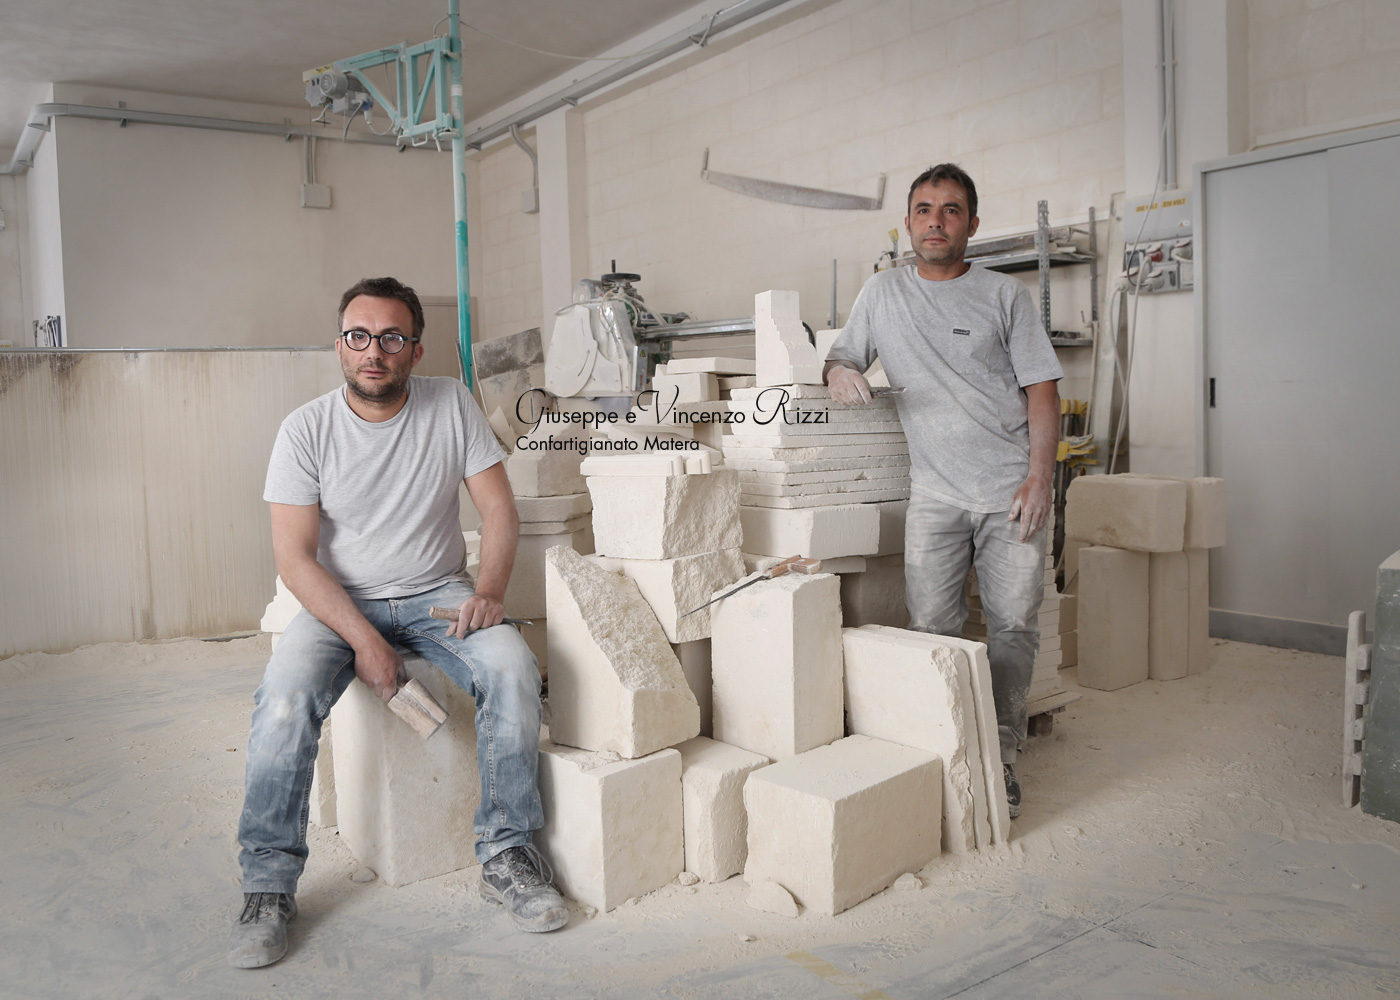 Giuseppe e Vincenzo Rizzi